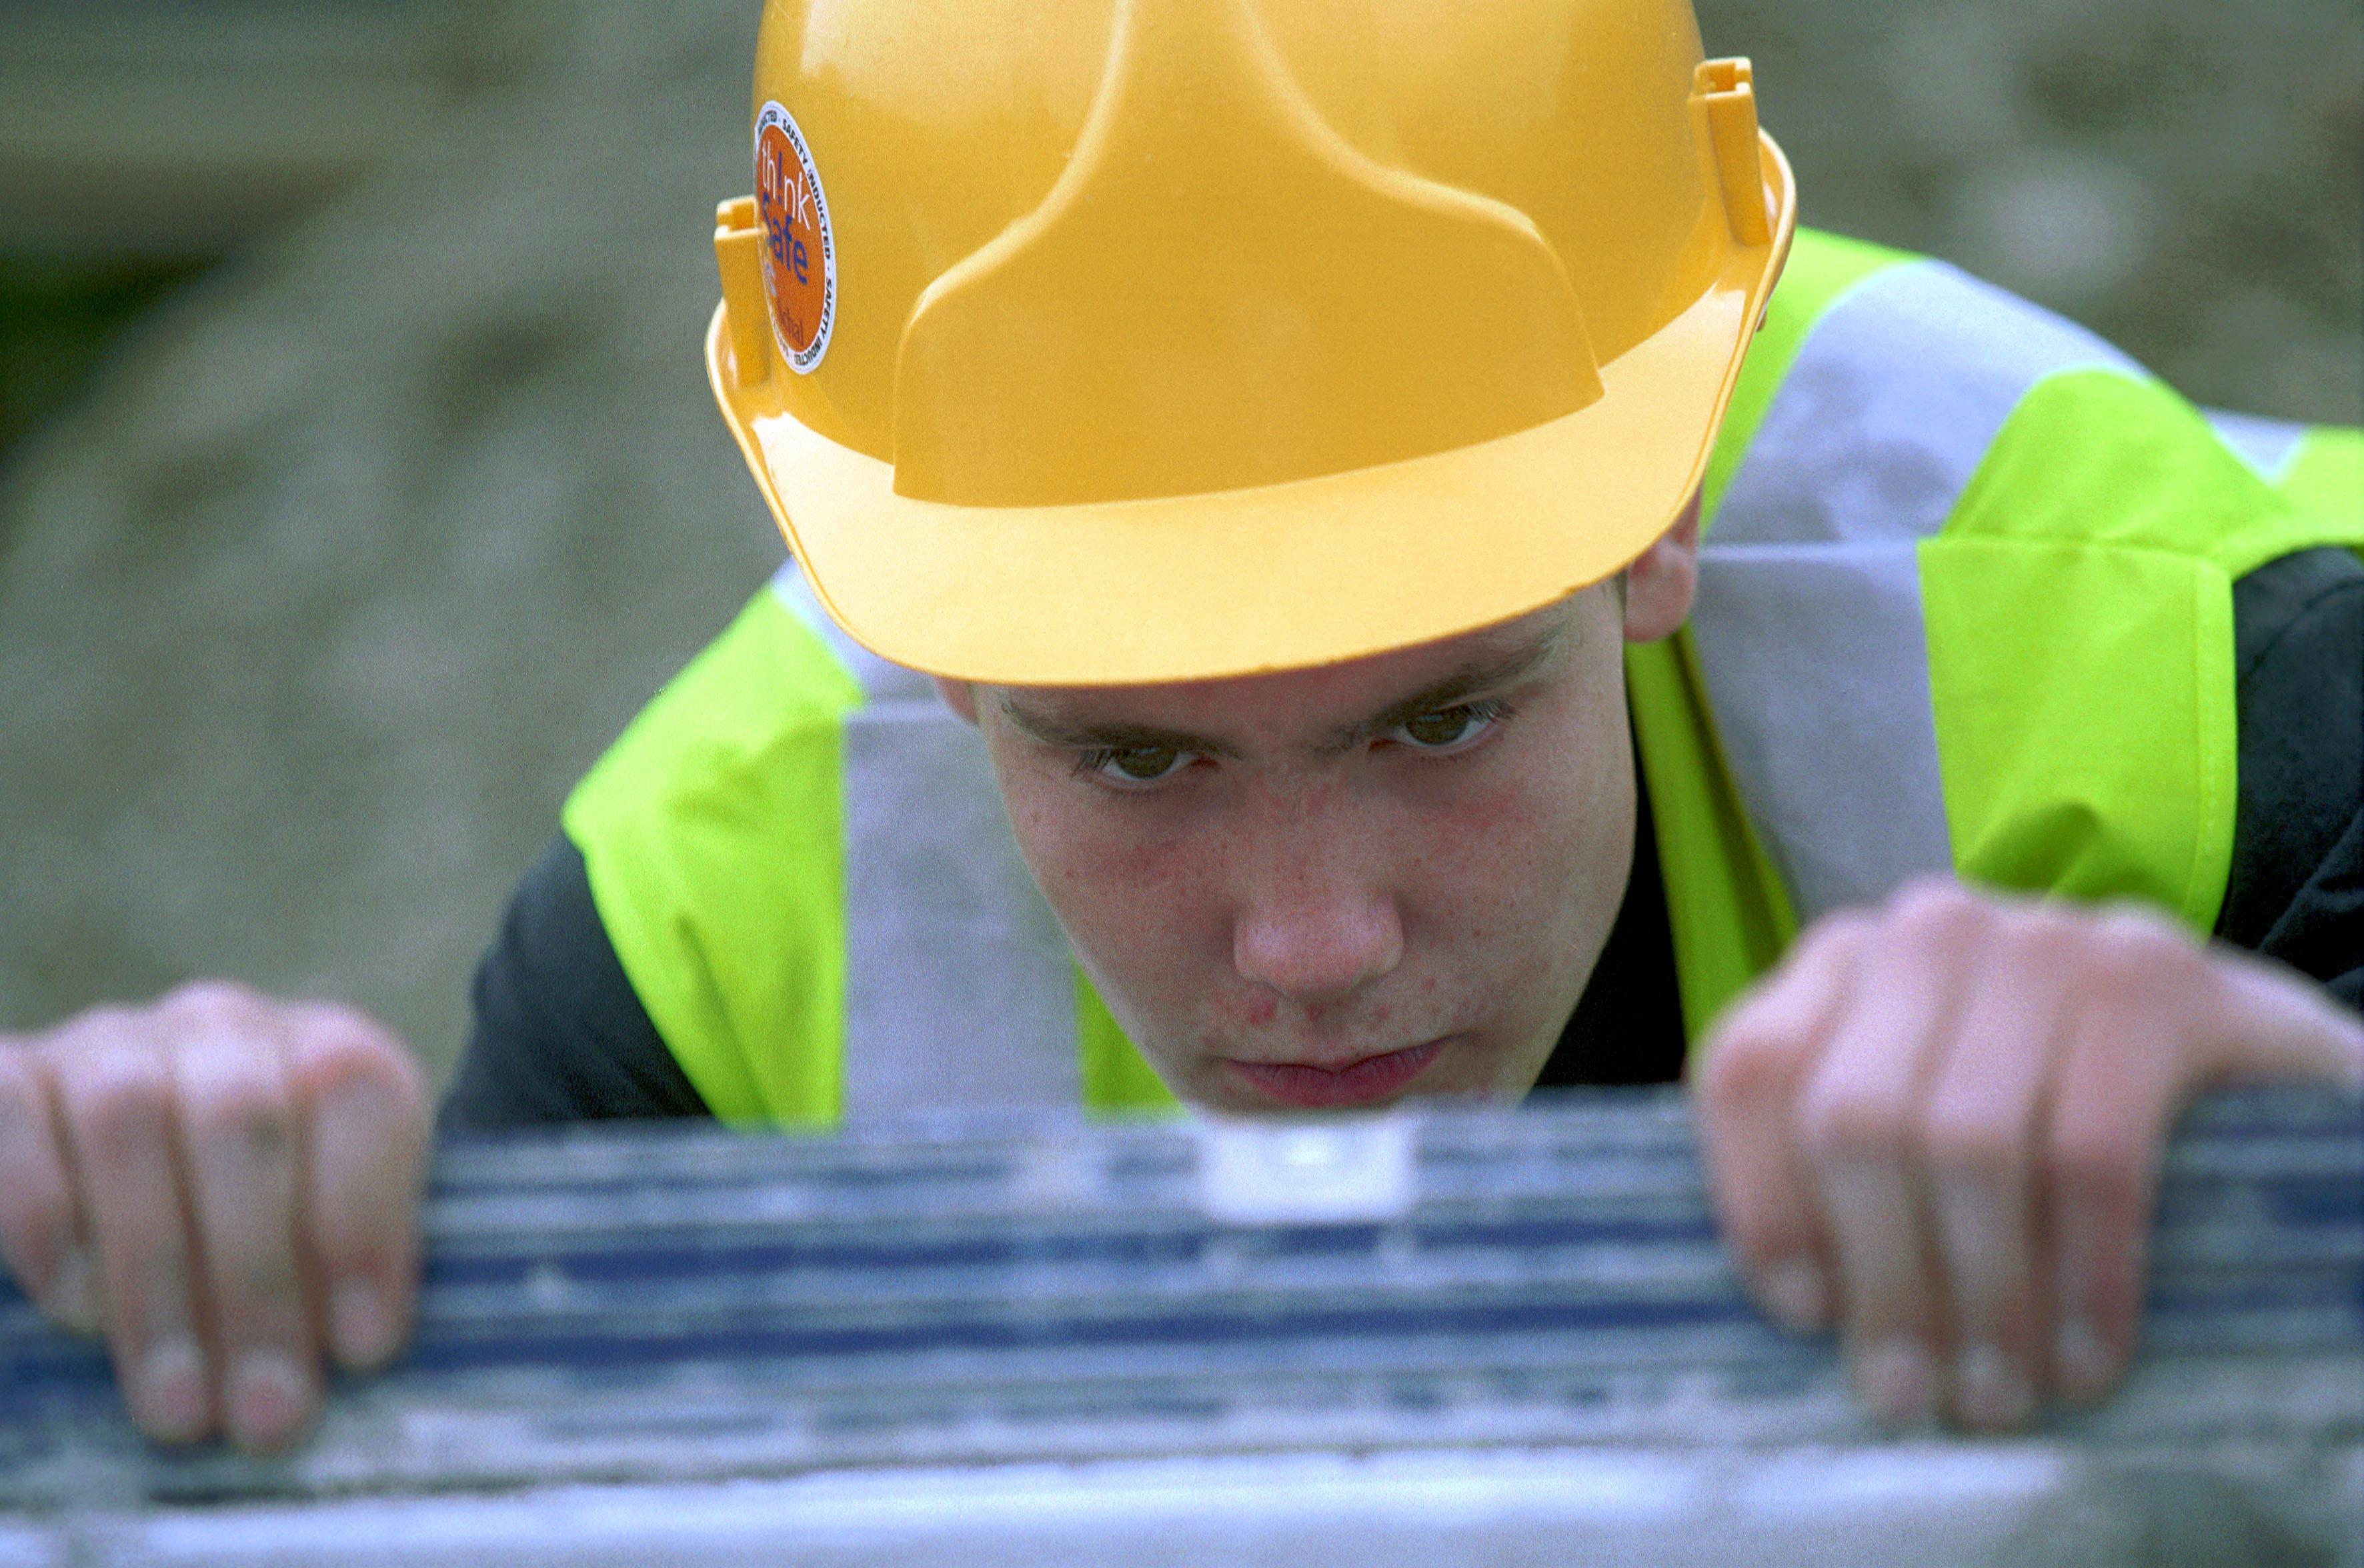 william rutledge construction engineer - HD3545×2352